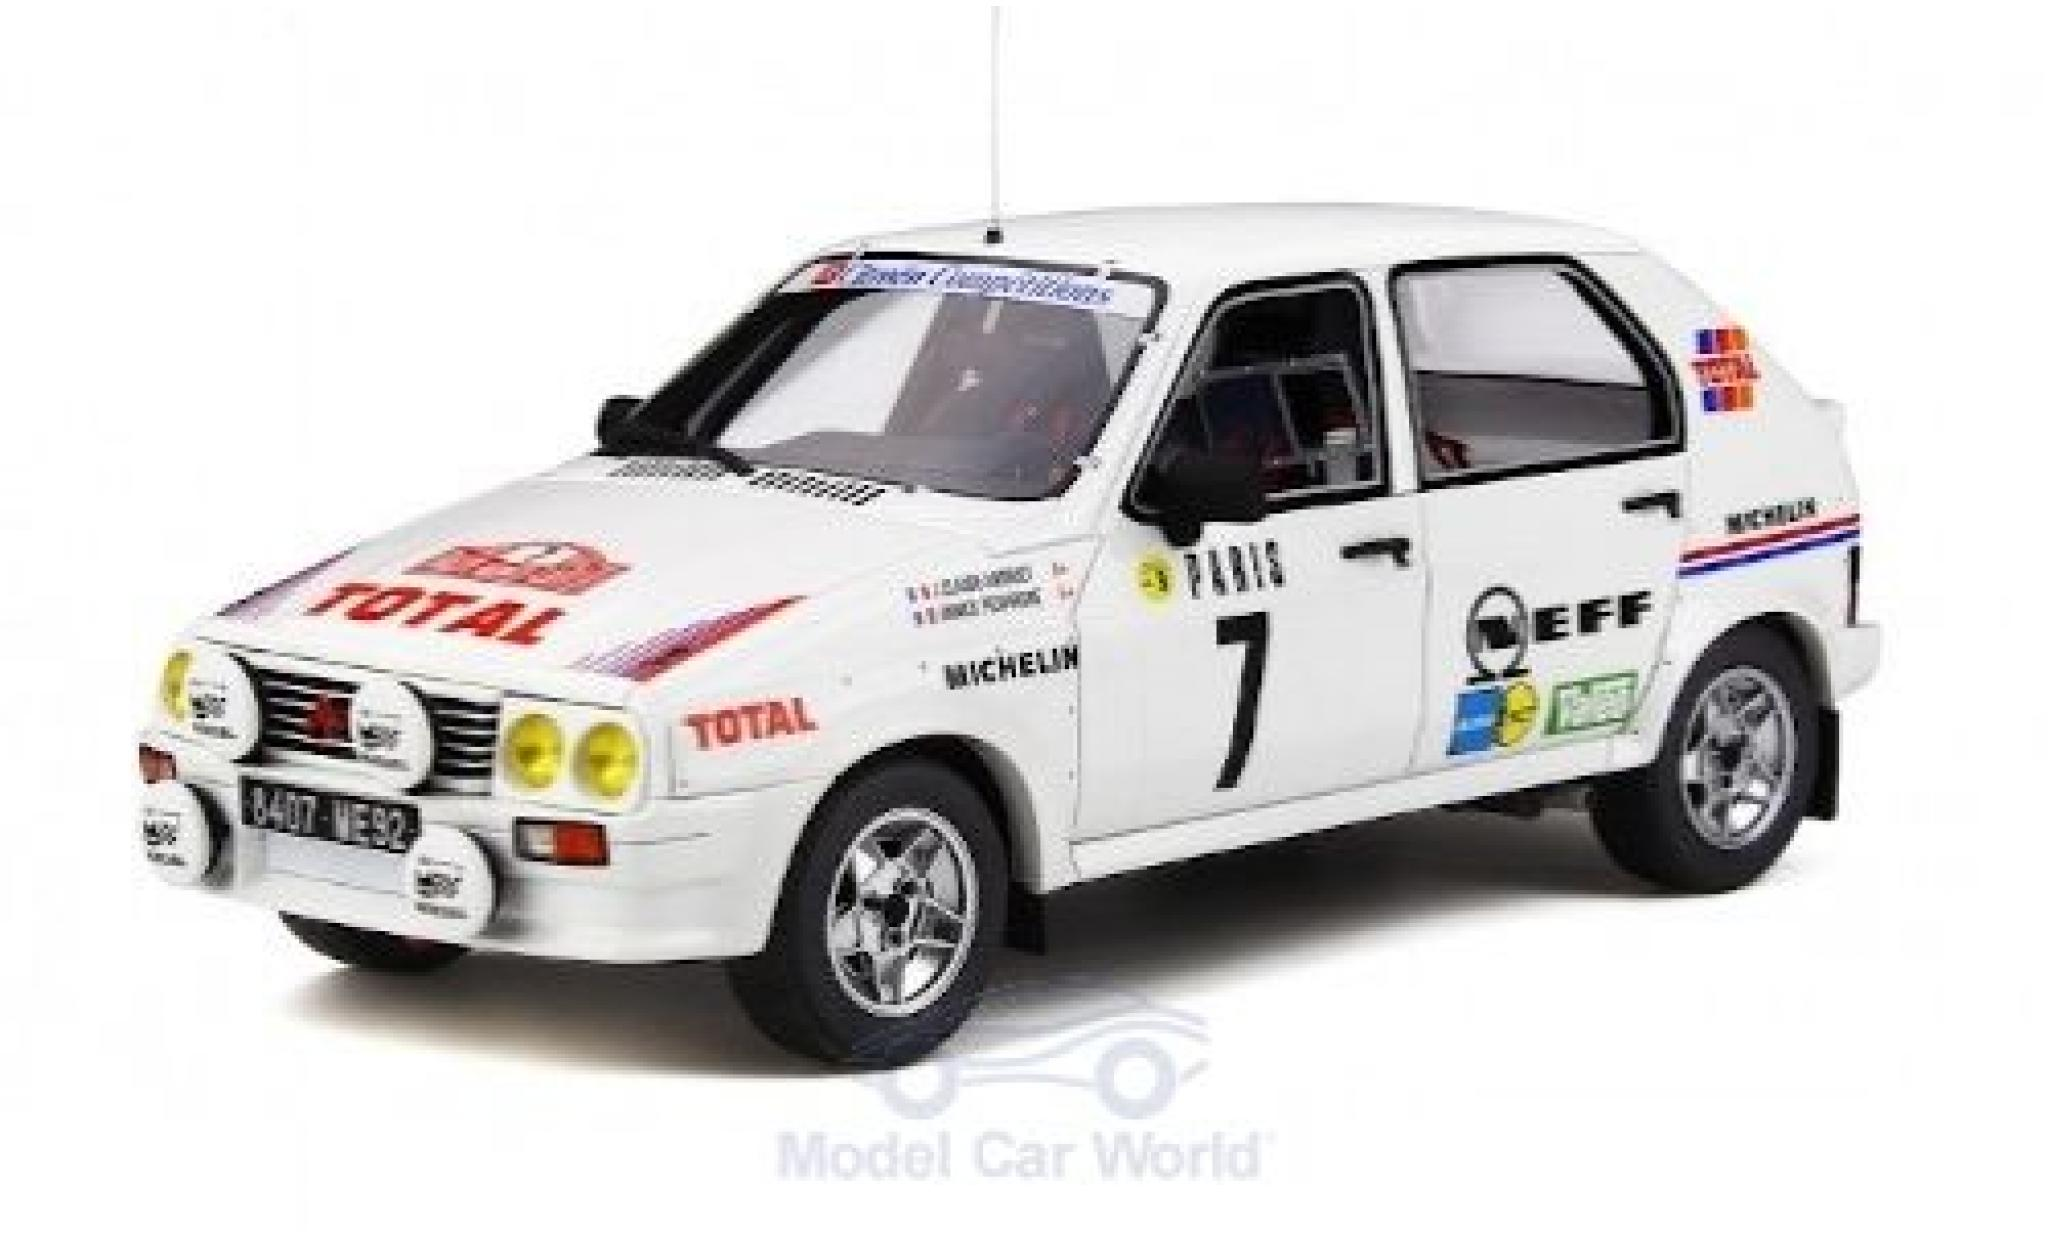 Citroen Visa 1/18 Ottomobile 1000 Pistes Gr.B No.7 Rallye WM Rallye Monte Carlo 1985 J-C.Andruet/A.Peuvergne